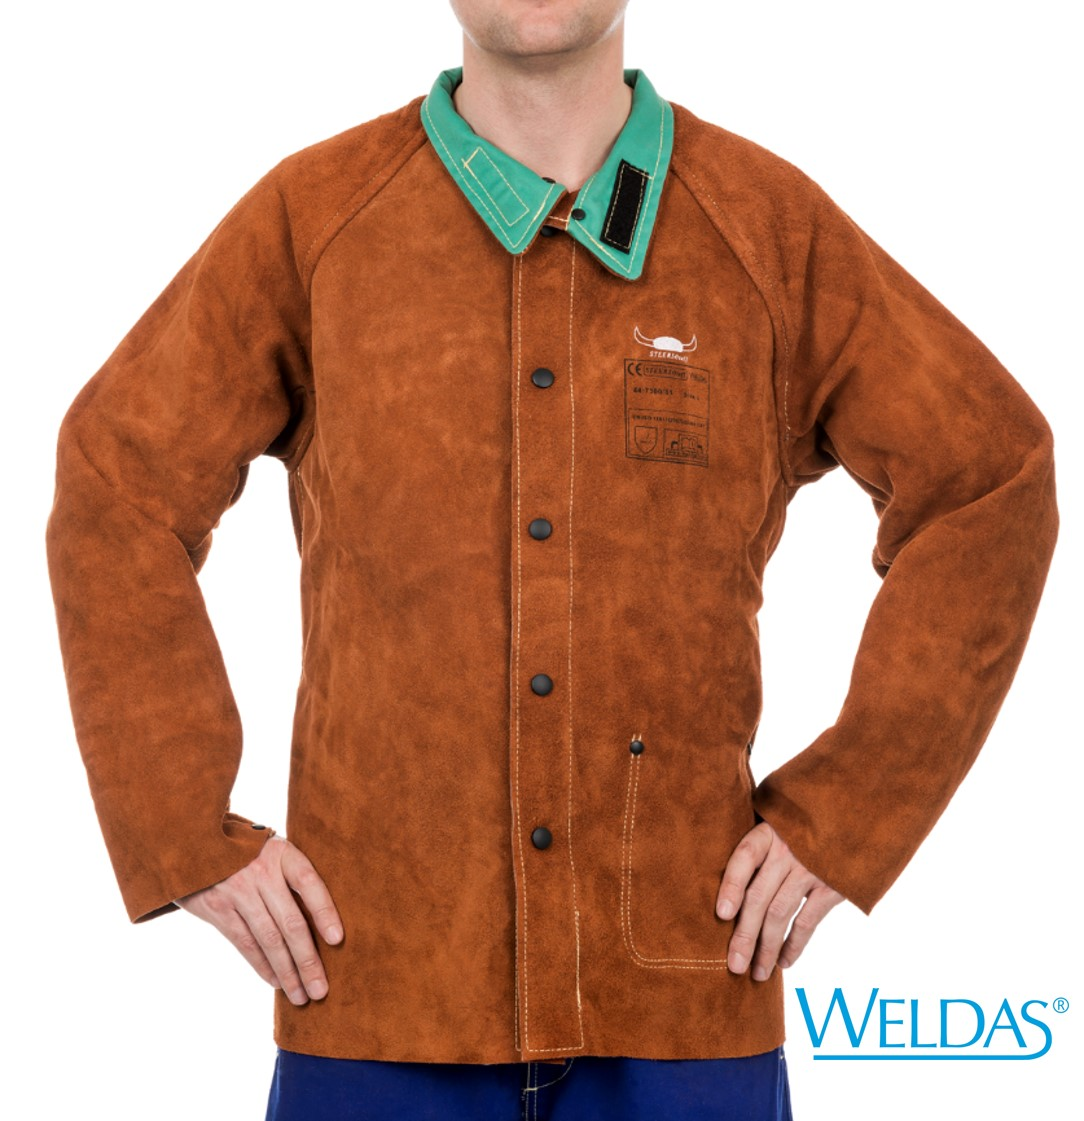 Casaco WELDAS Lava Brown 44-7300